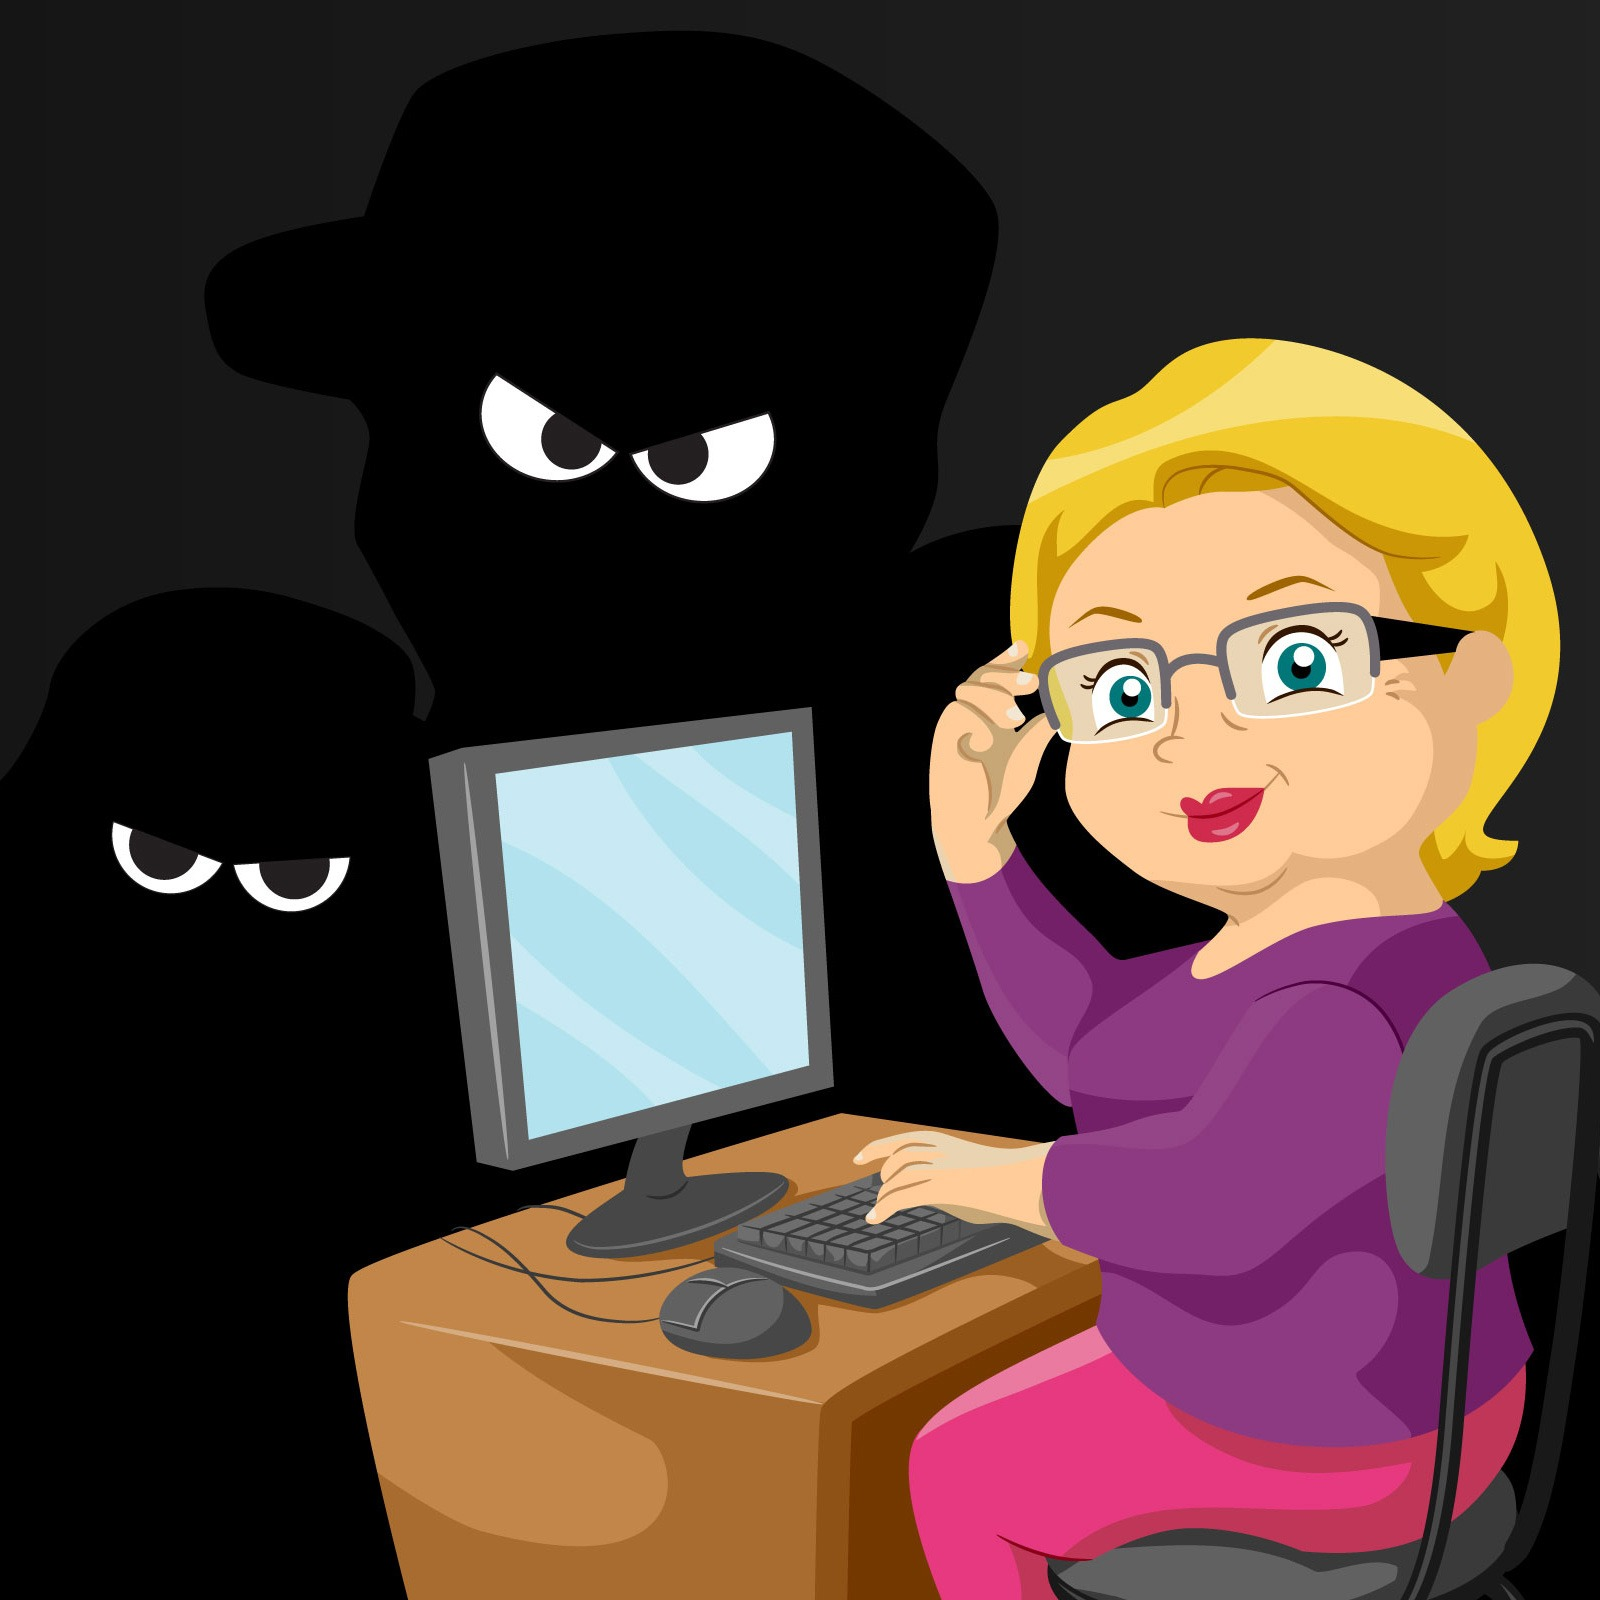 Mission: Hacking Grandma